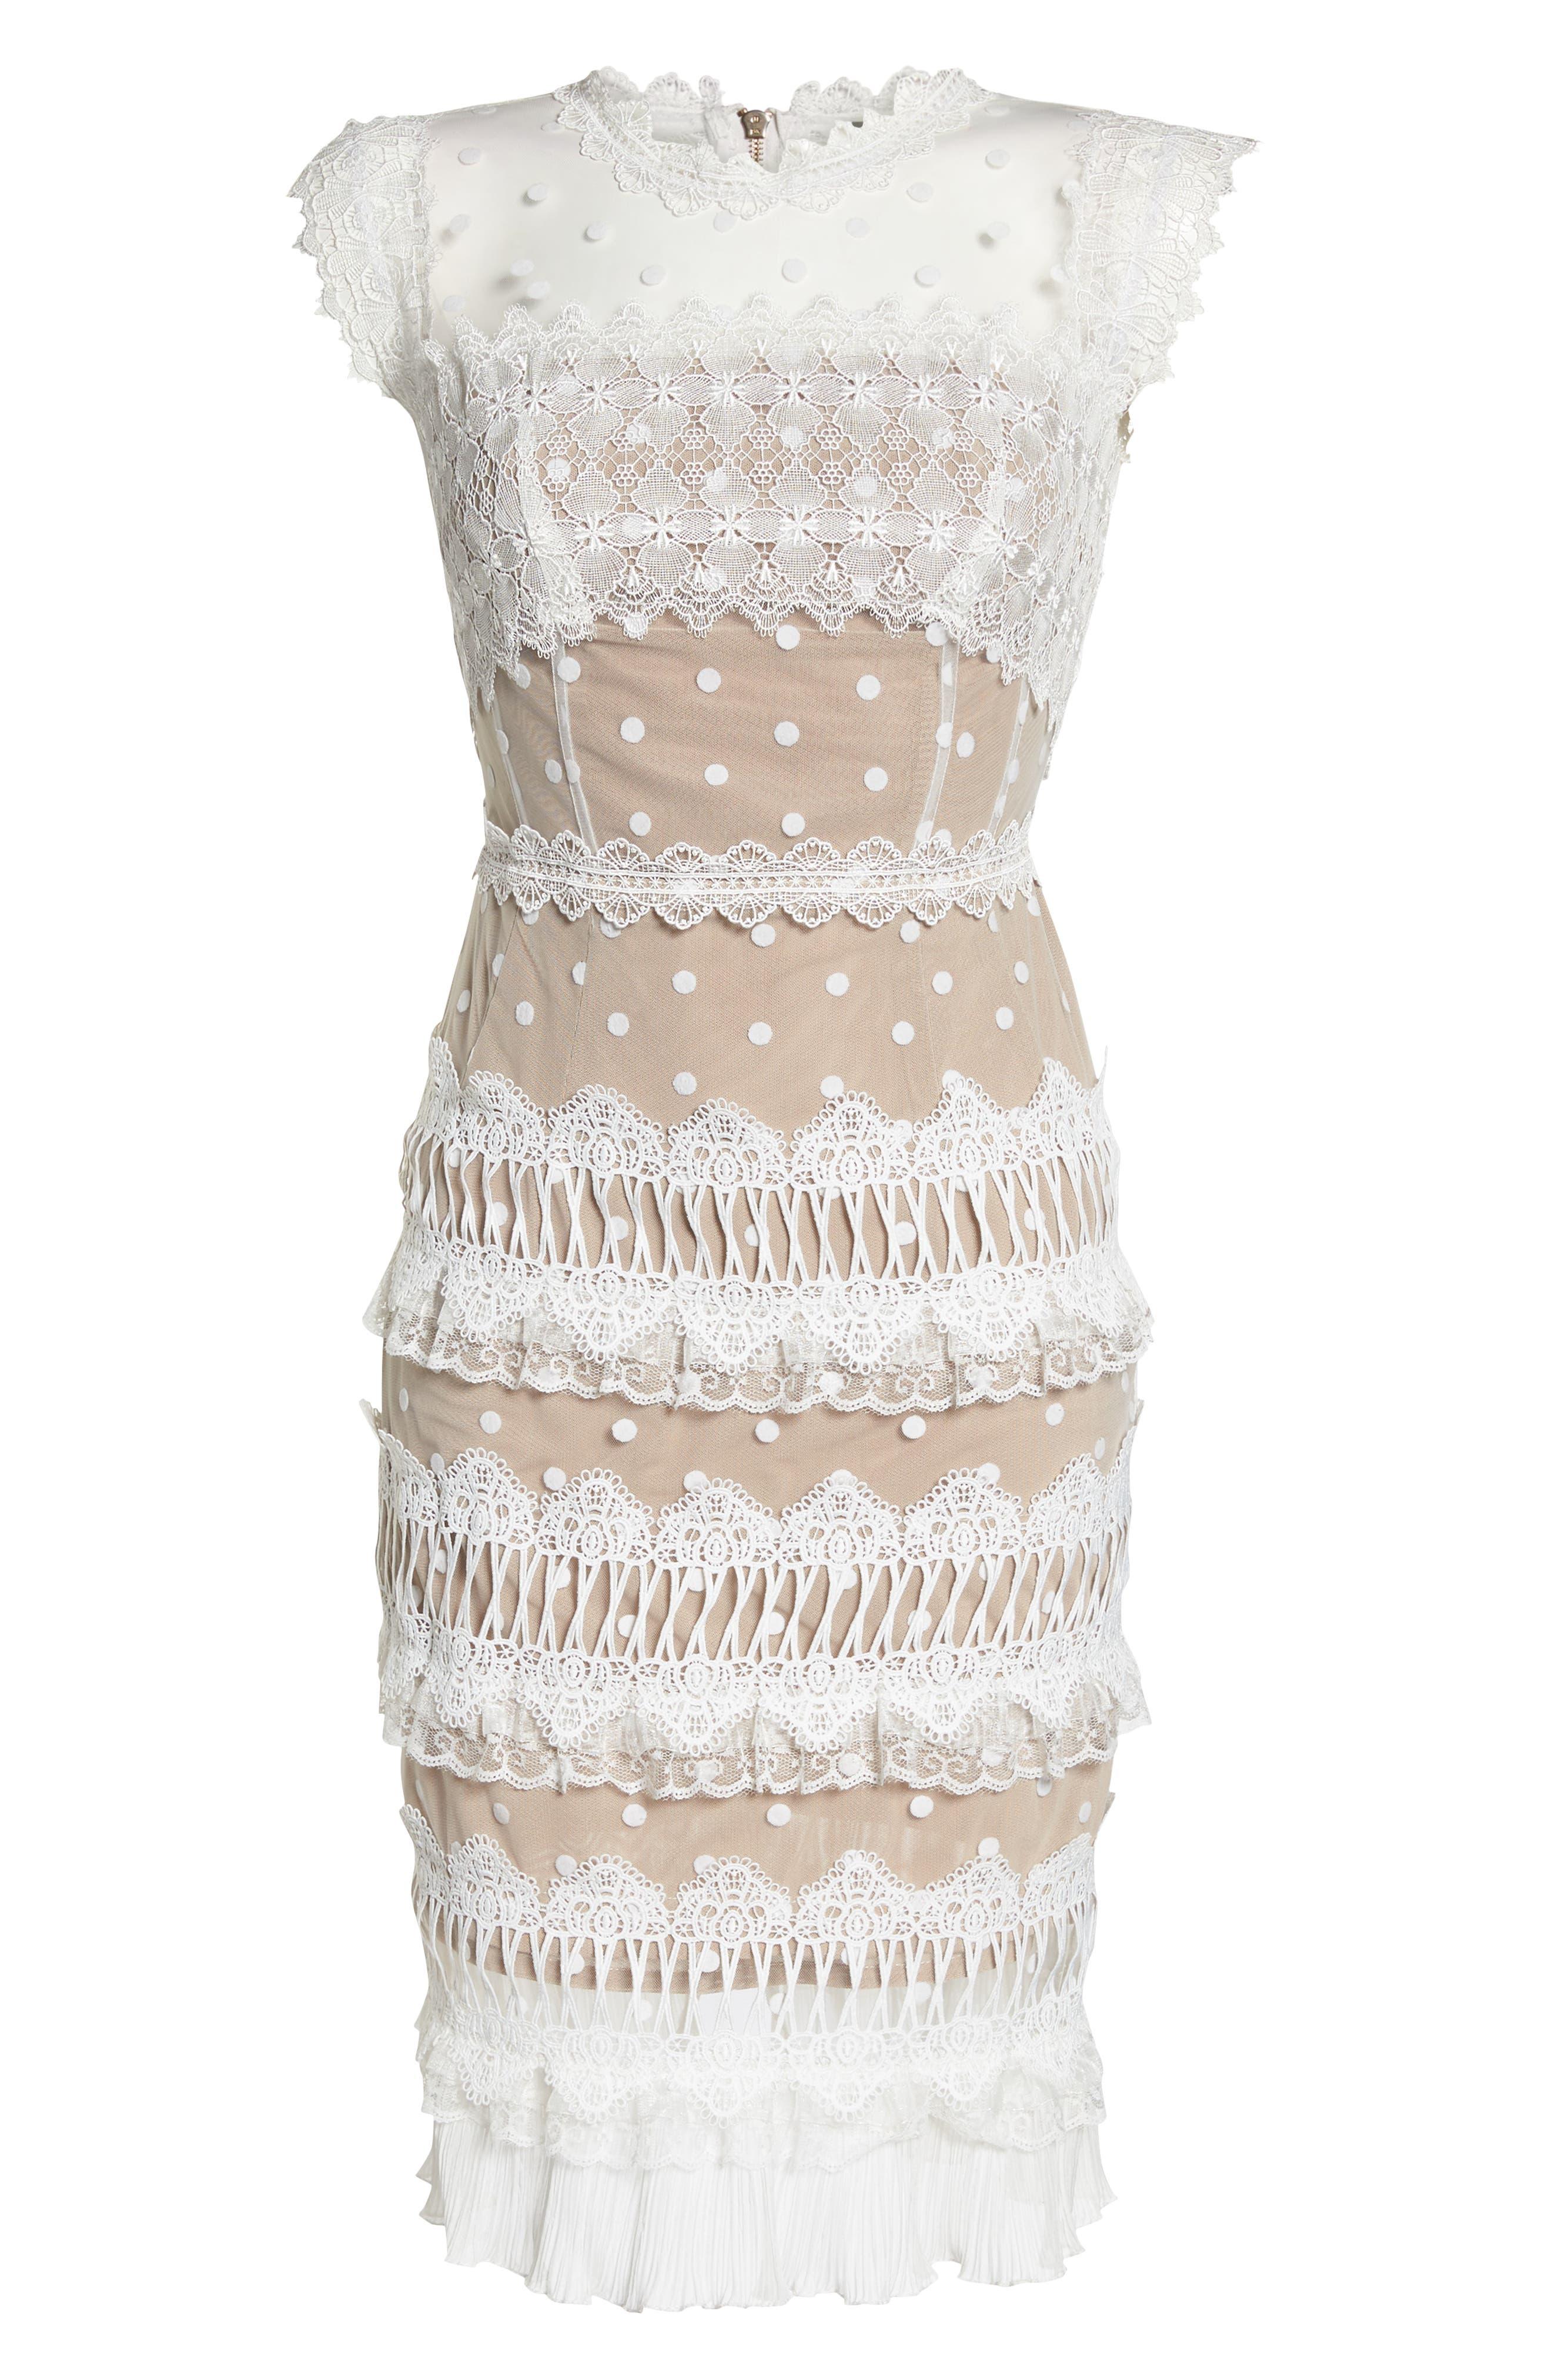 Majiorca Dot Lace Cocktail Dress,                             Alternate thumbnail 6, color,                             White